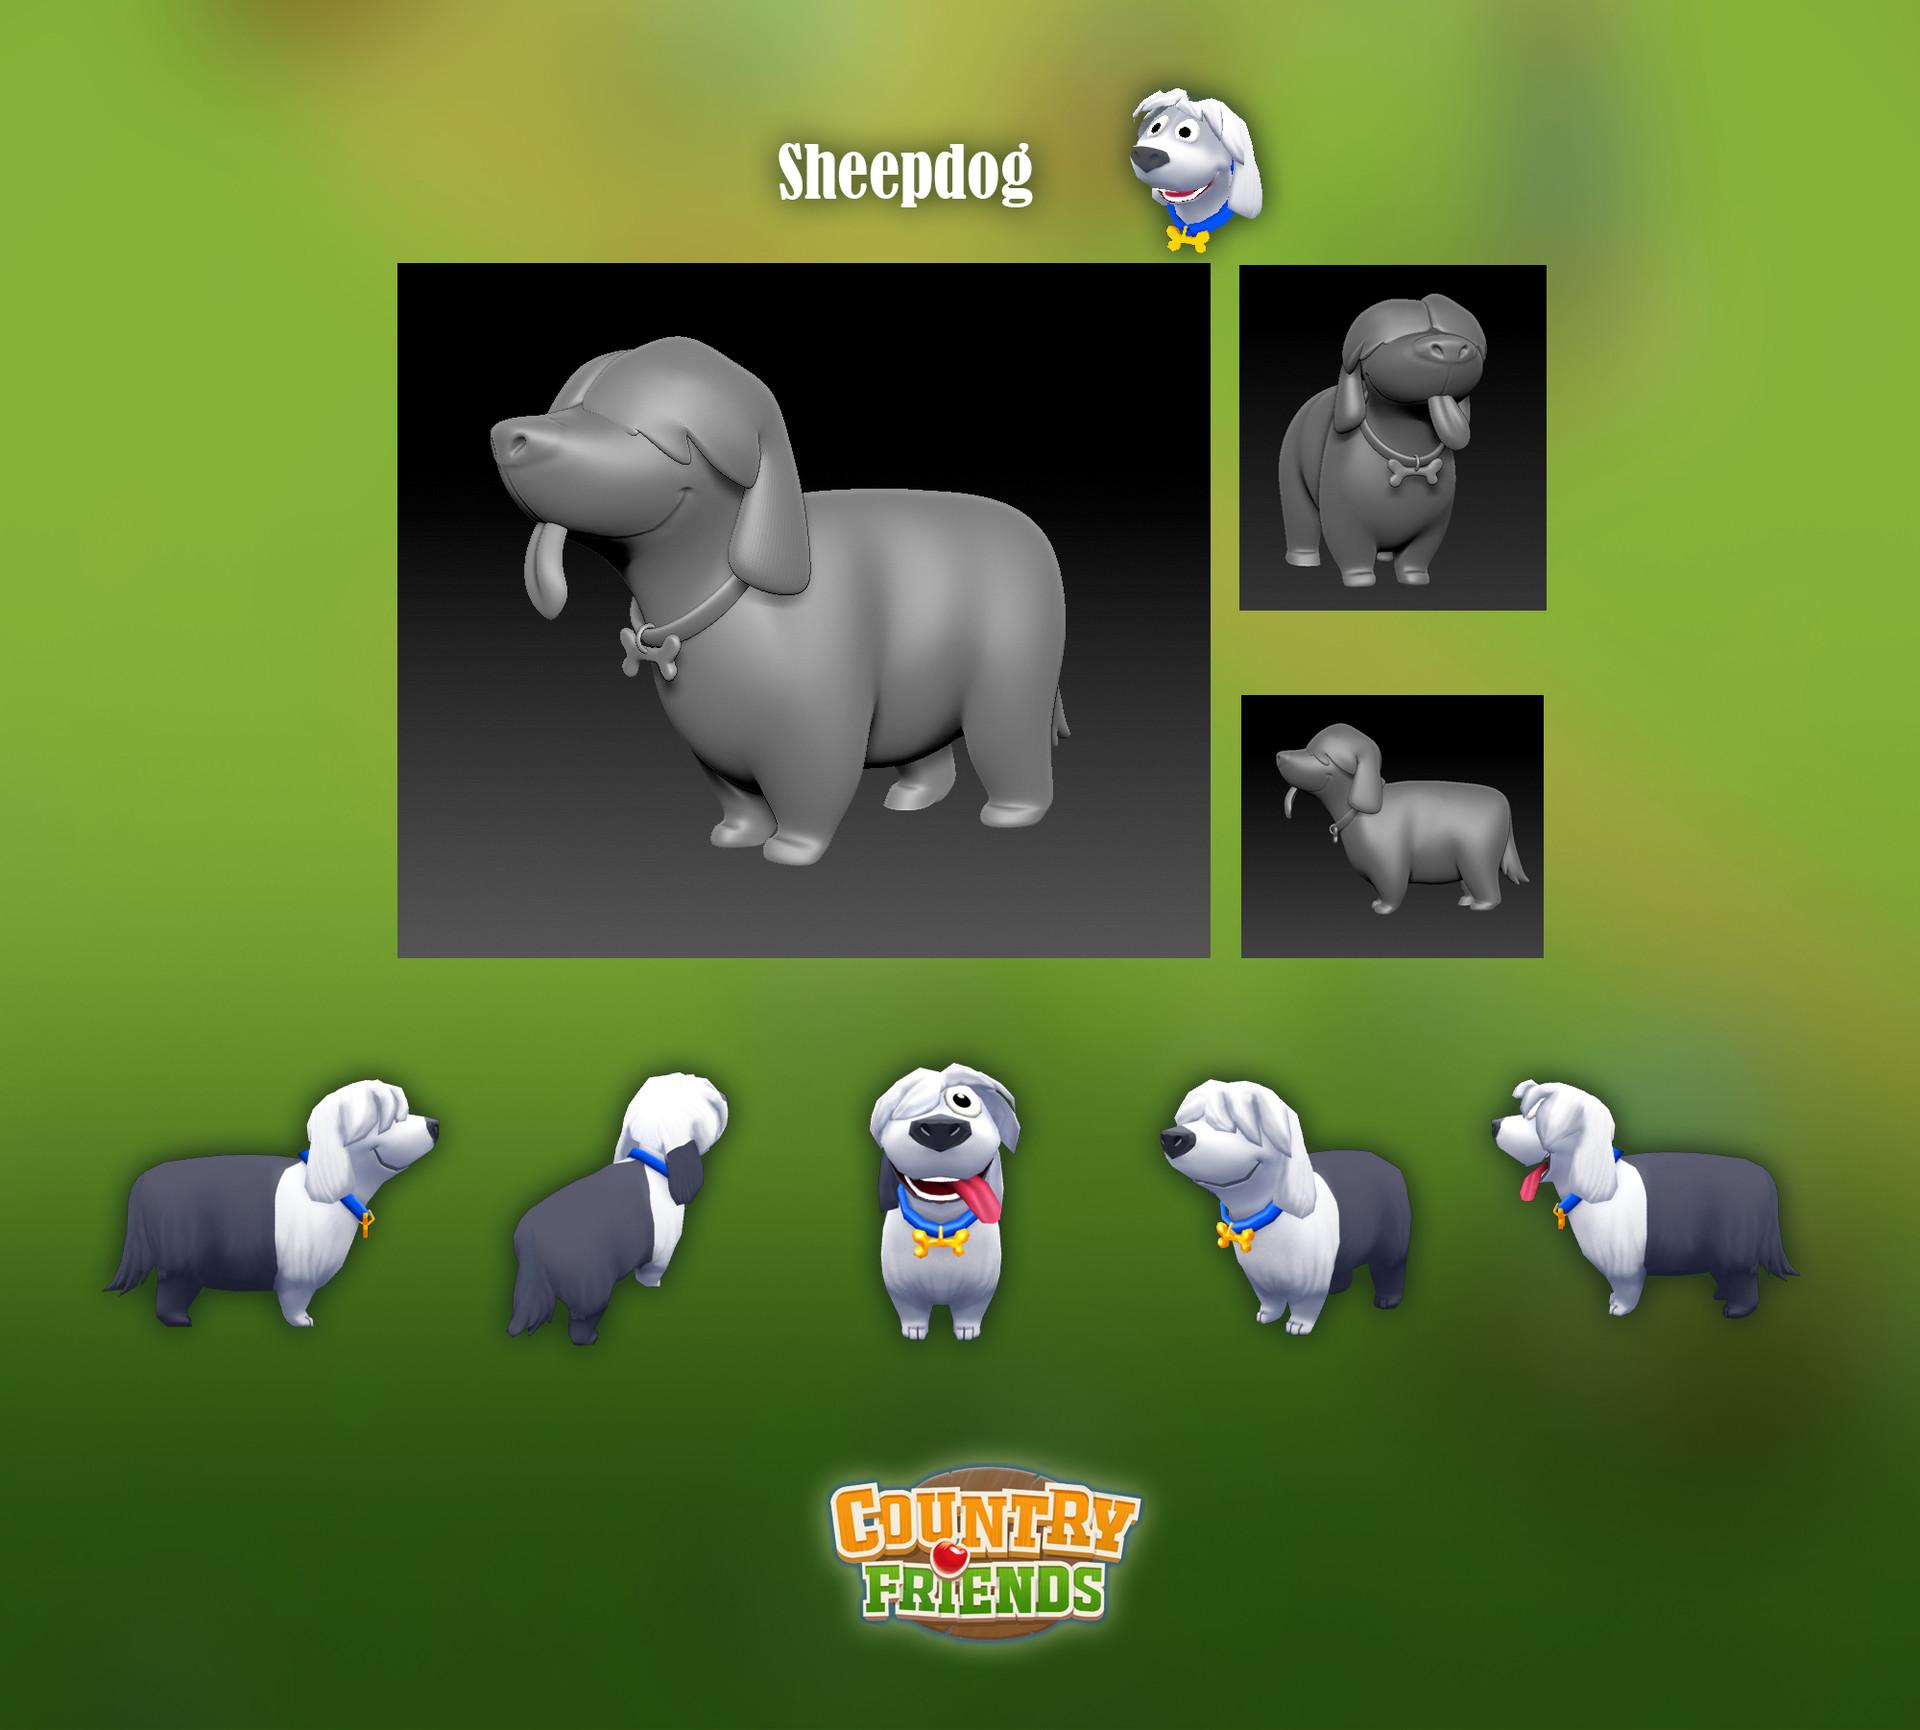 Soo ling lyle tassell sheepdog2